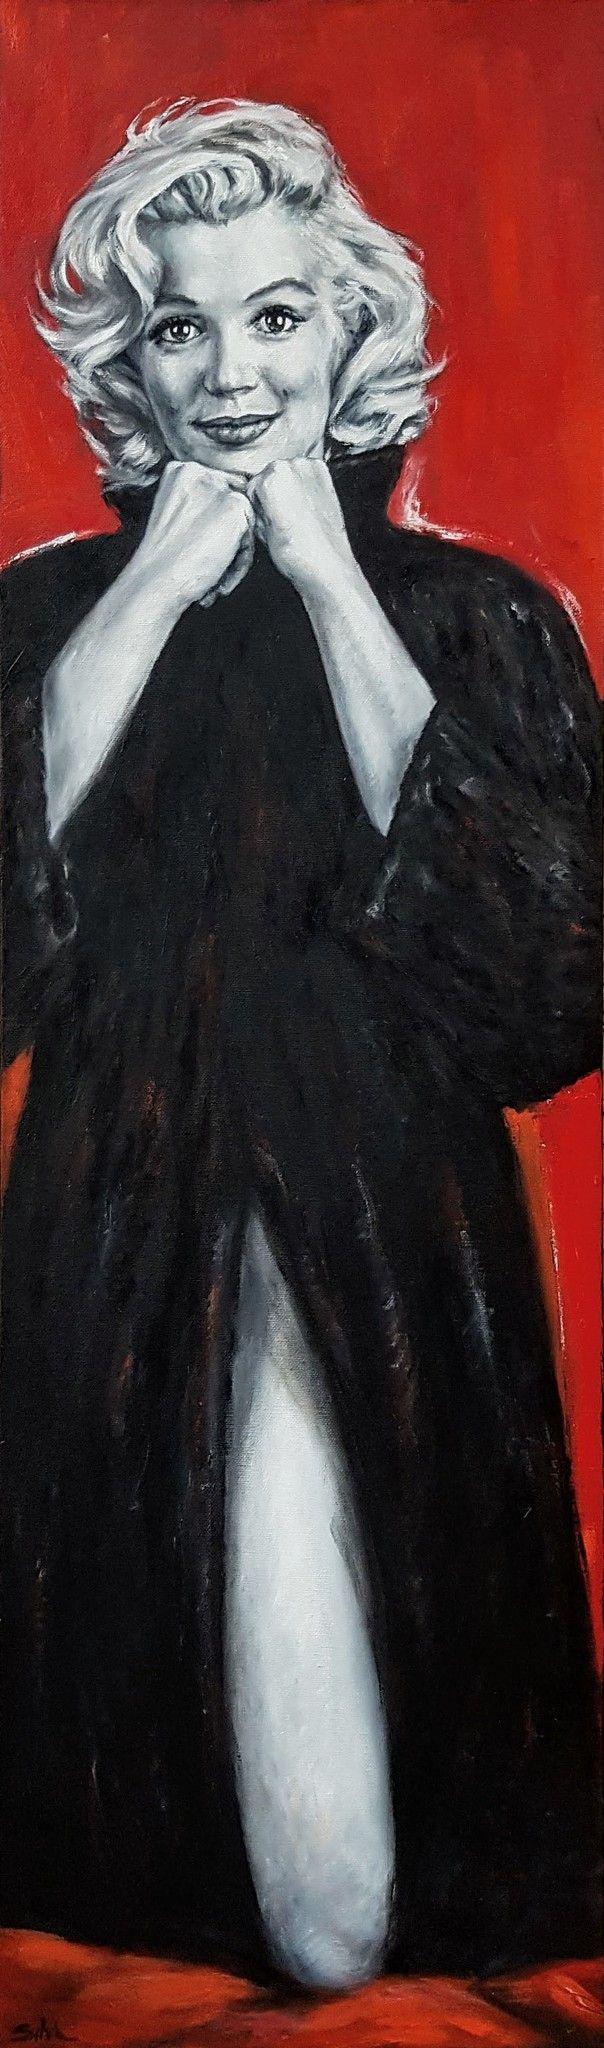 "OLIO SU TELA FRANCA SILVA "" MARILYN MONROE ""  dimensioni L 30 x H 100 cm."